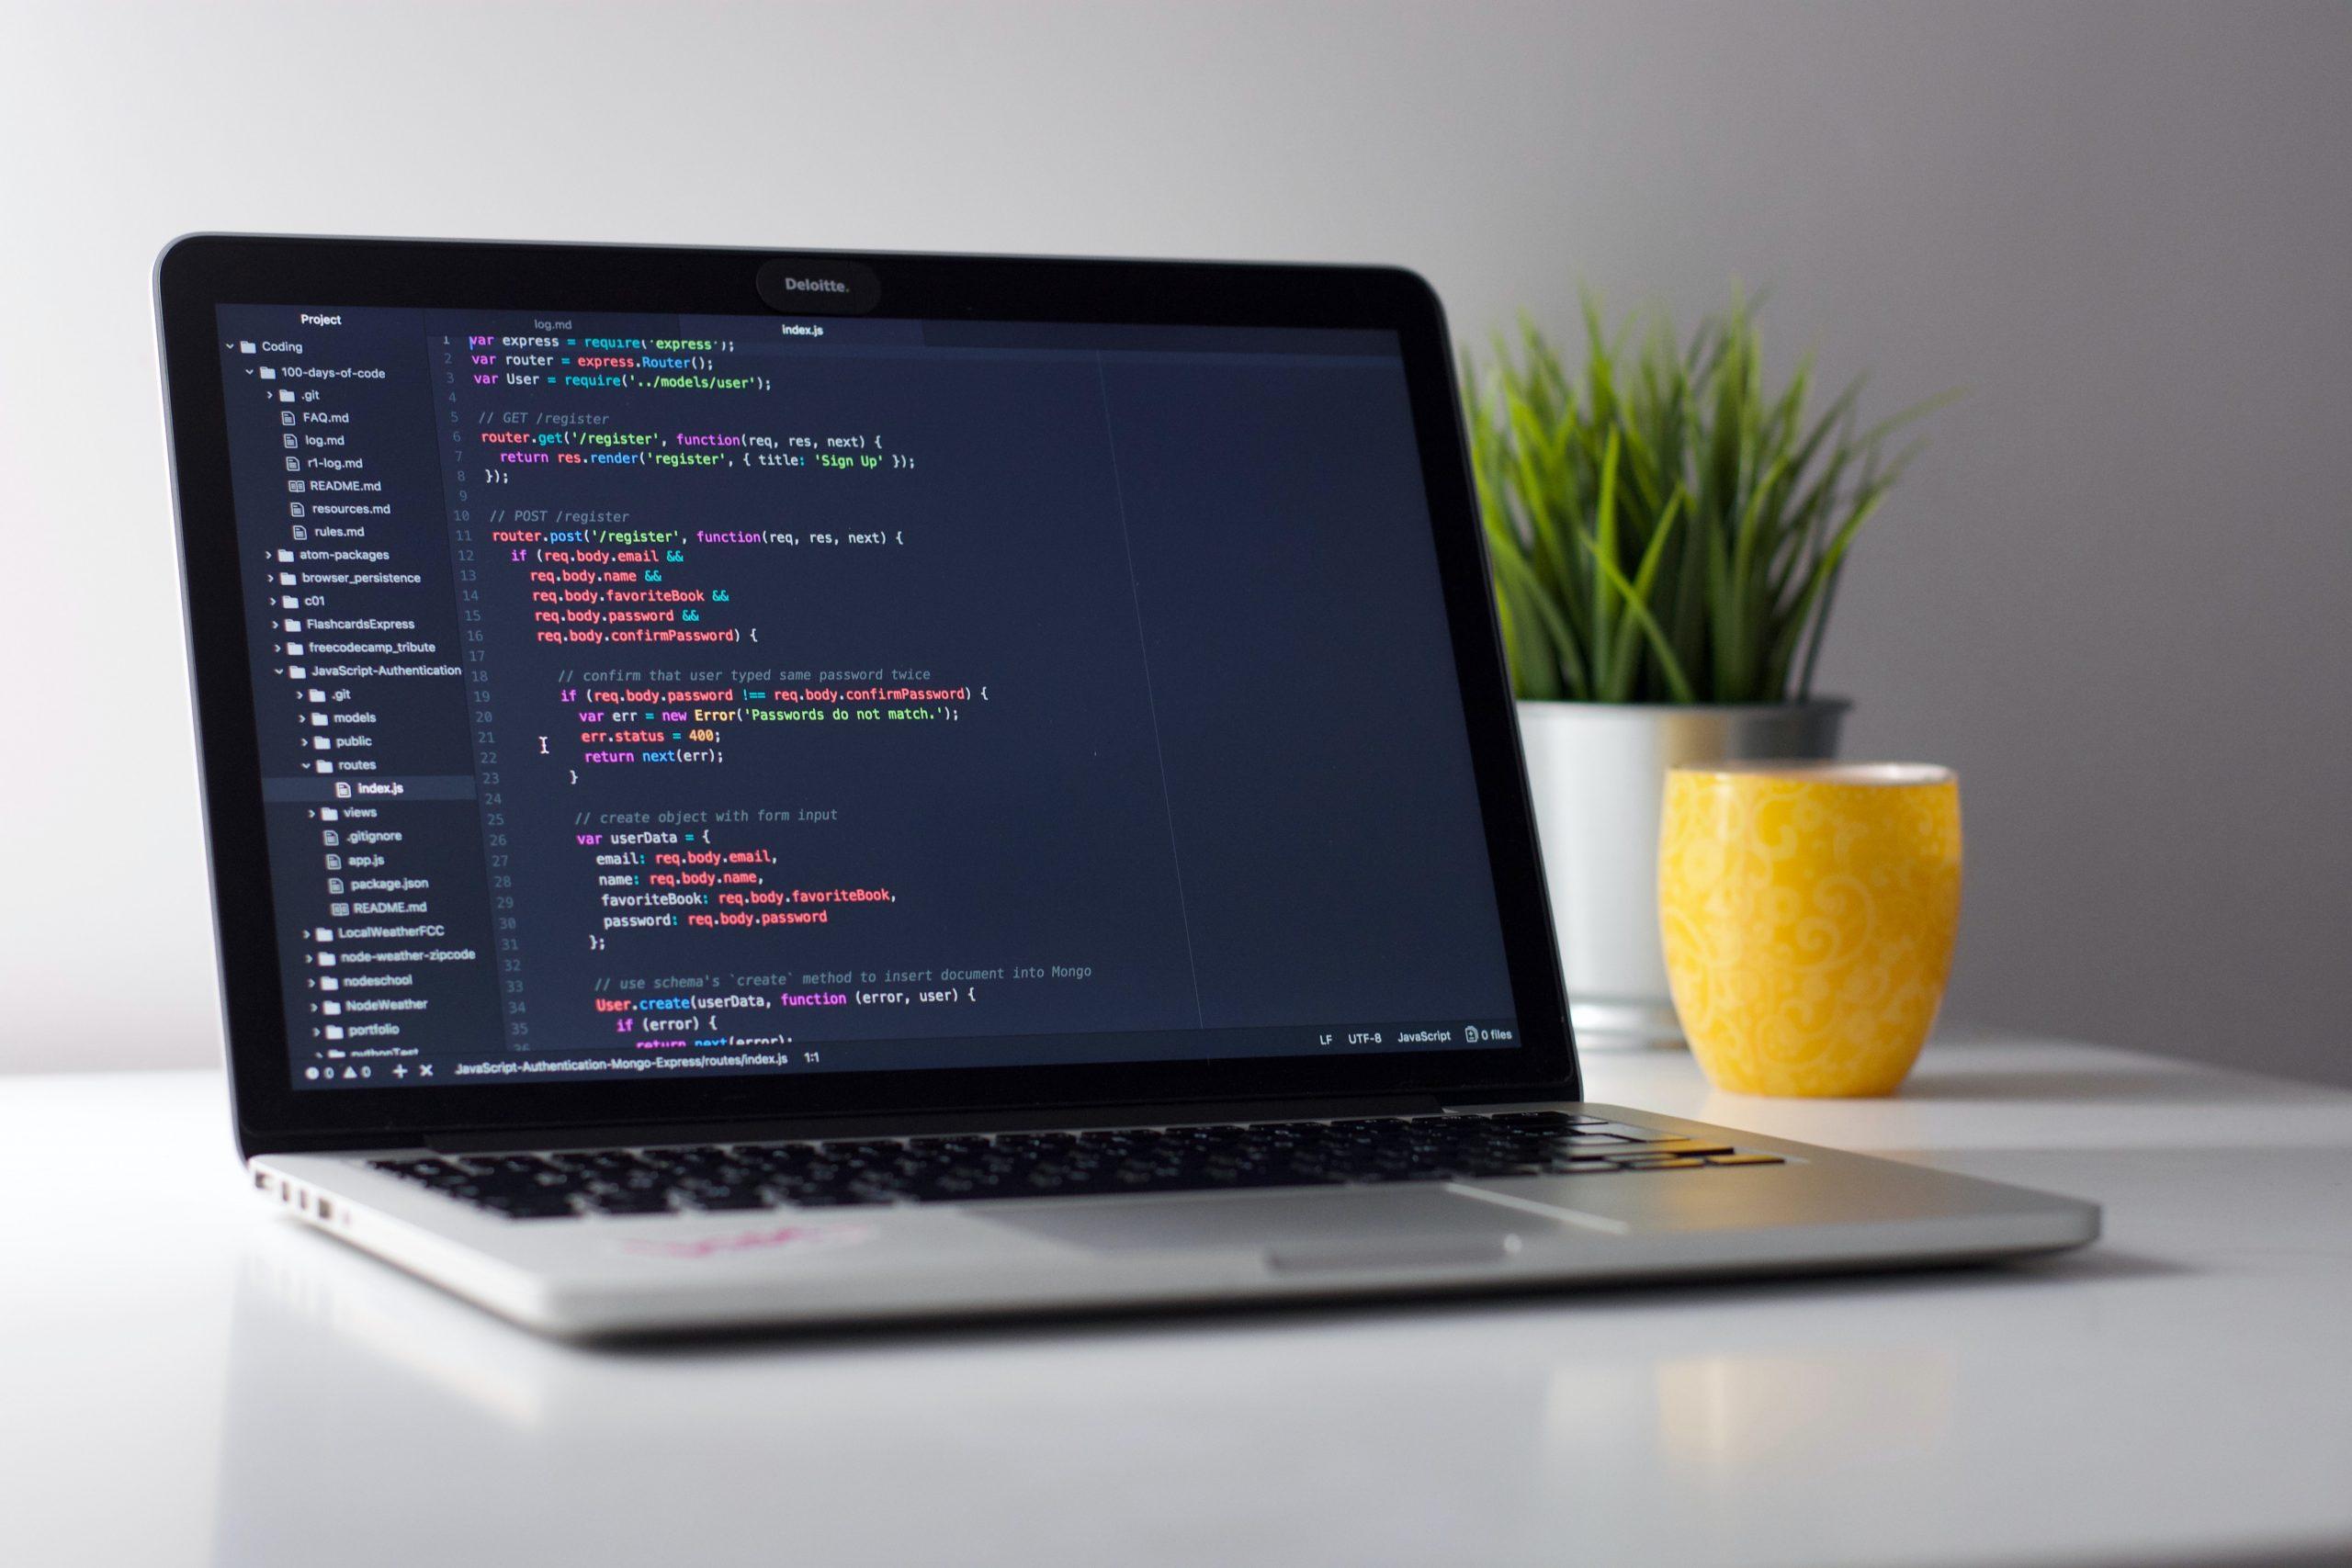 arbeta-i-wireframe-designa-skissa-hemsida-utan-kunskap-i-programmering